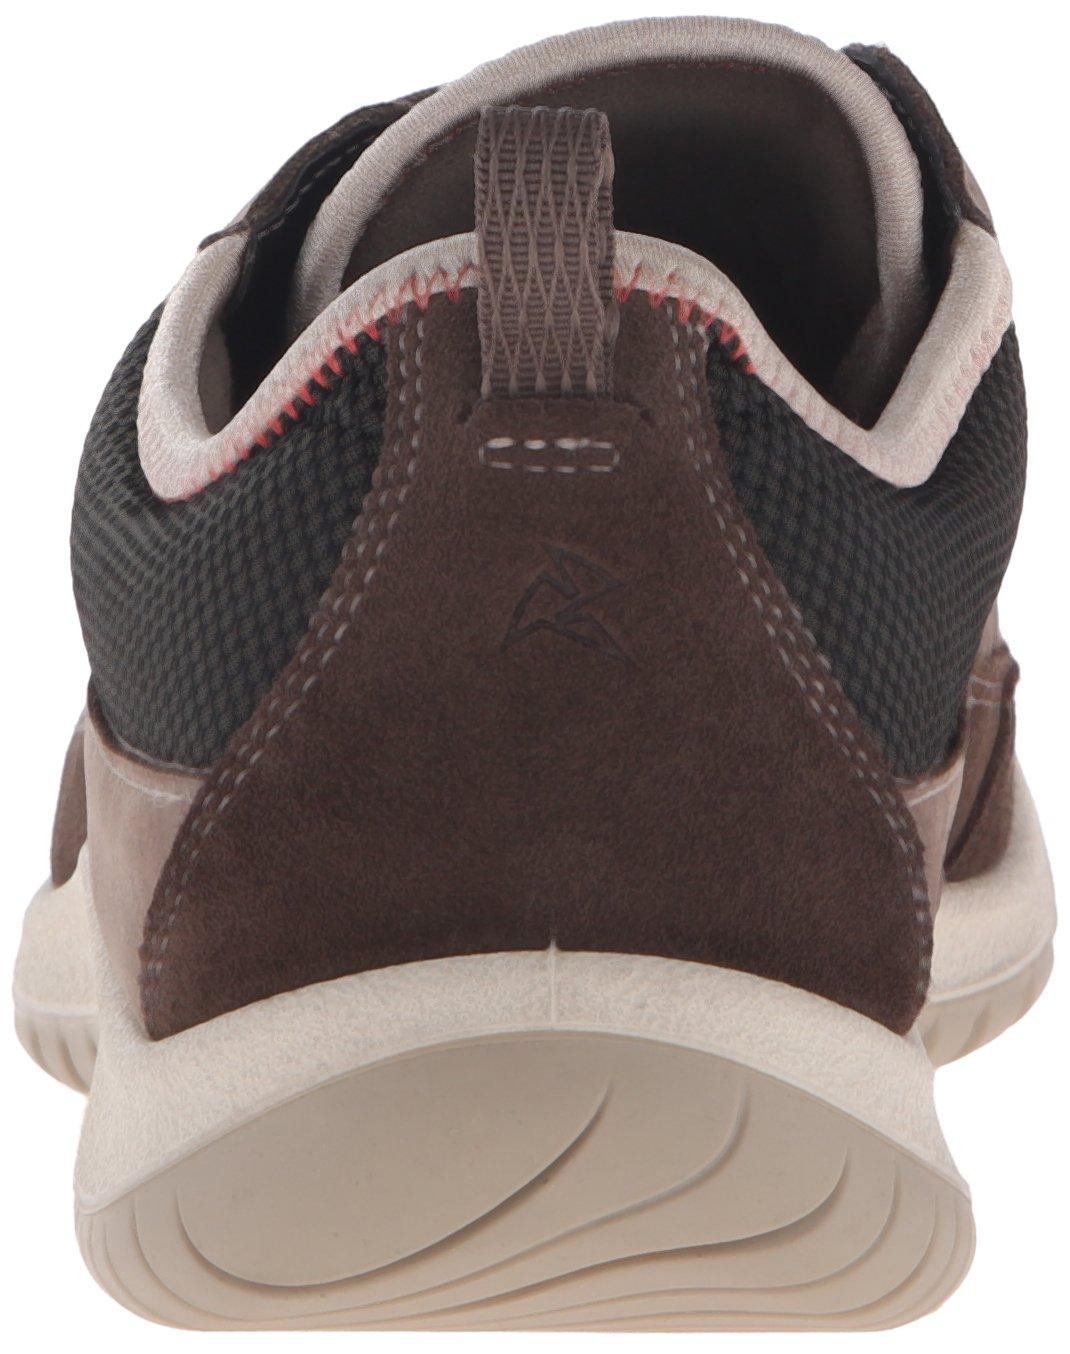 71Z1iqsbSSL - ECCO Women's Aspina Multisport Outdoor Shoes